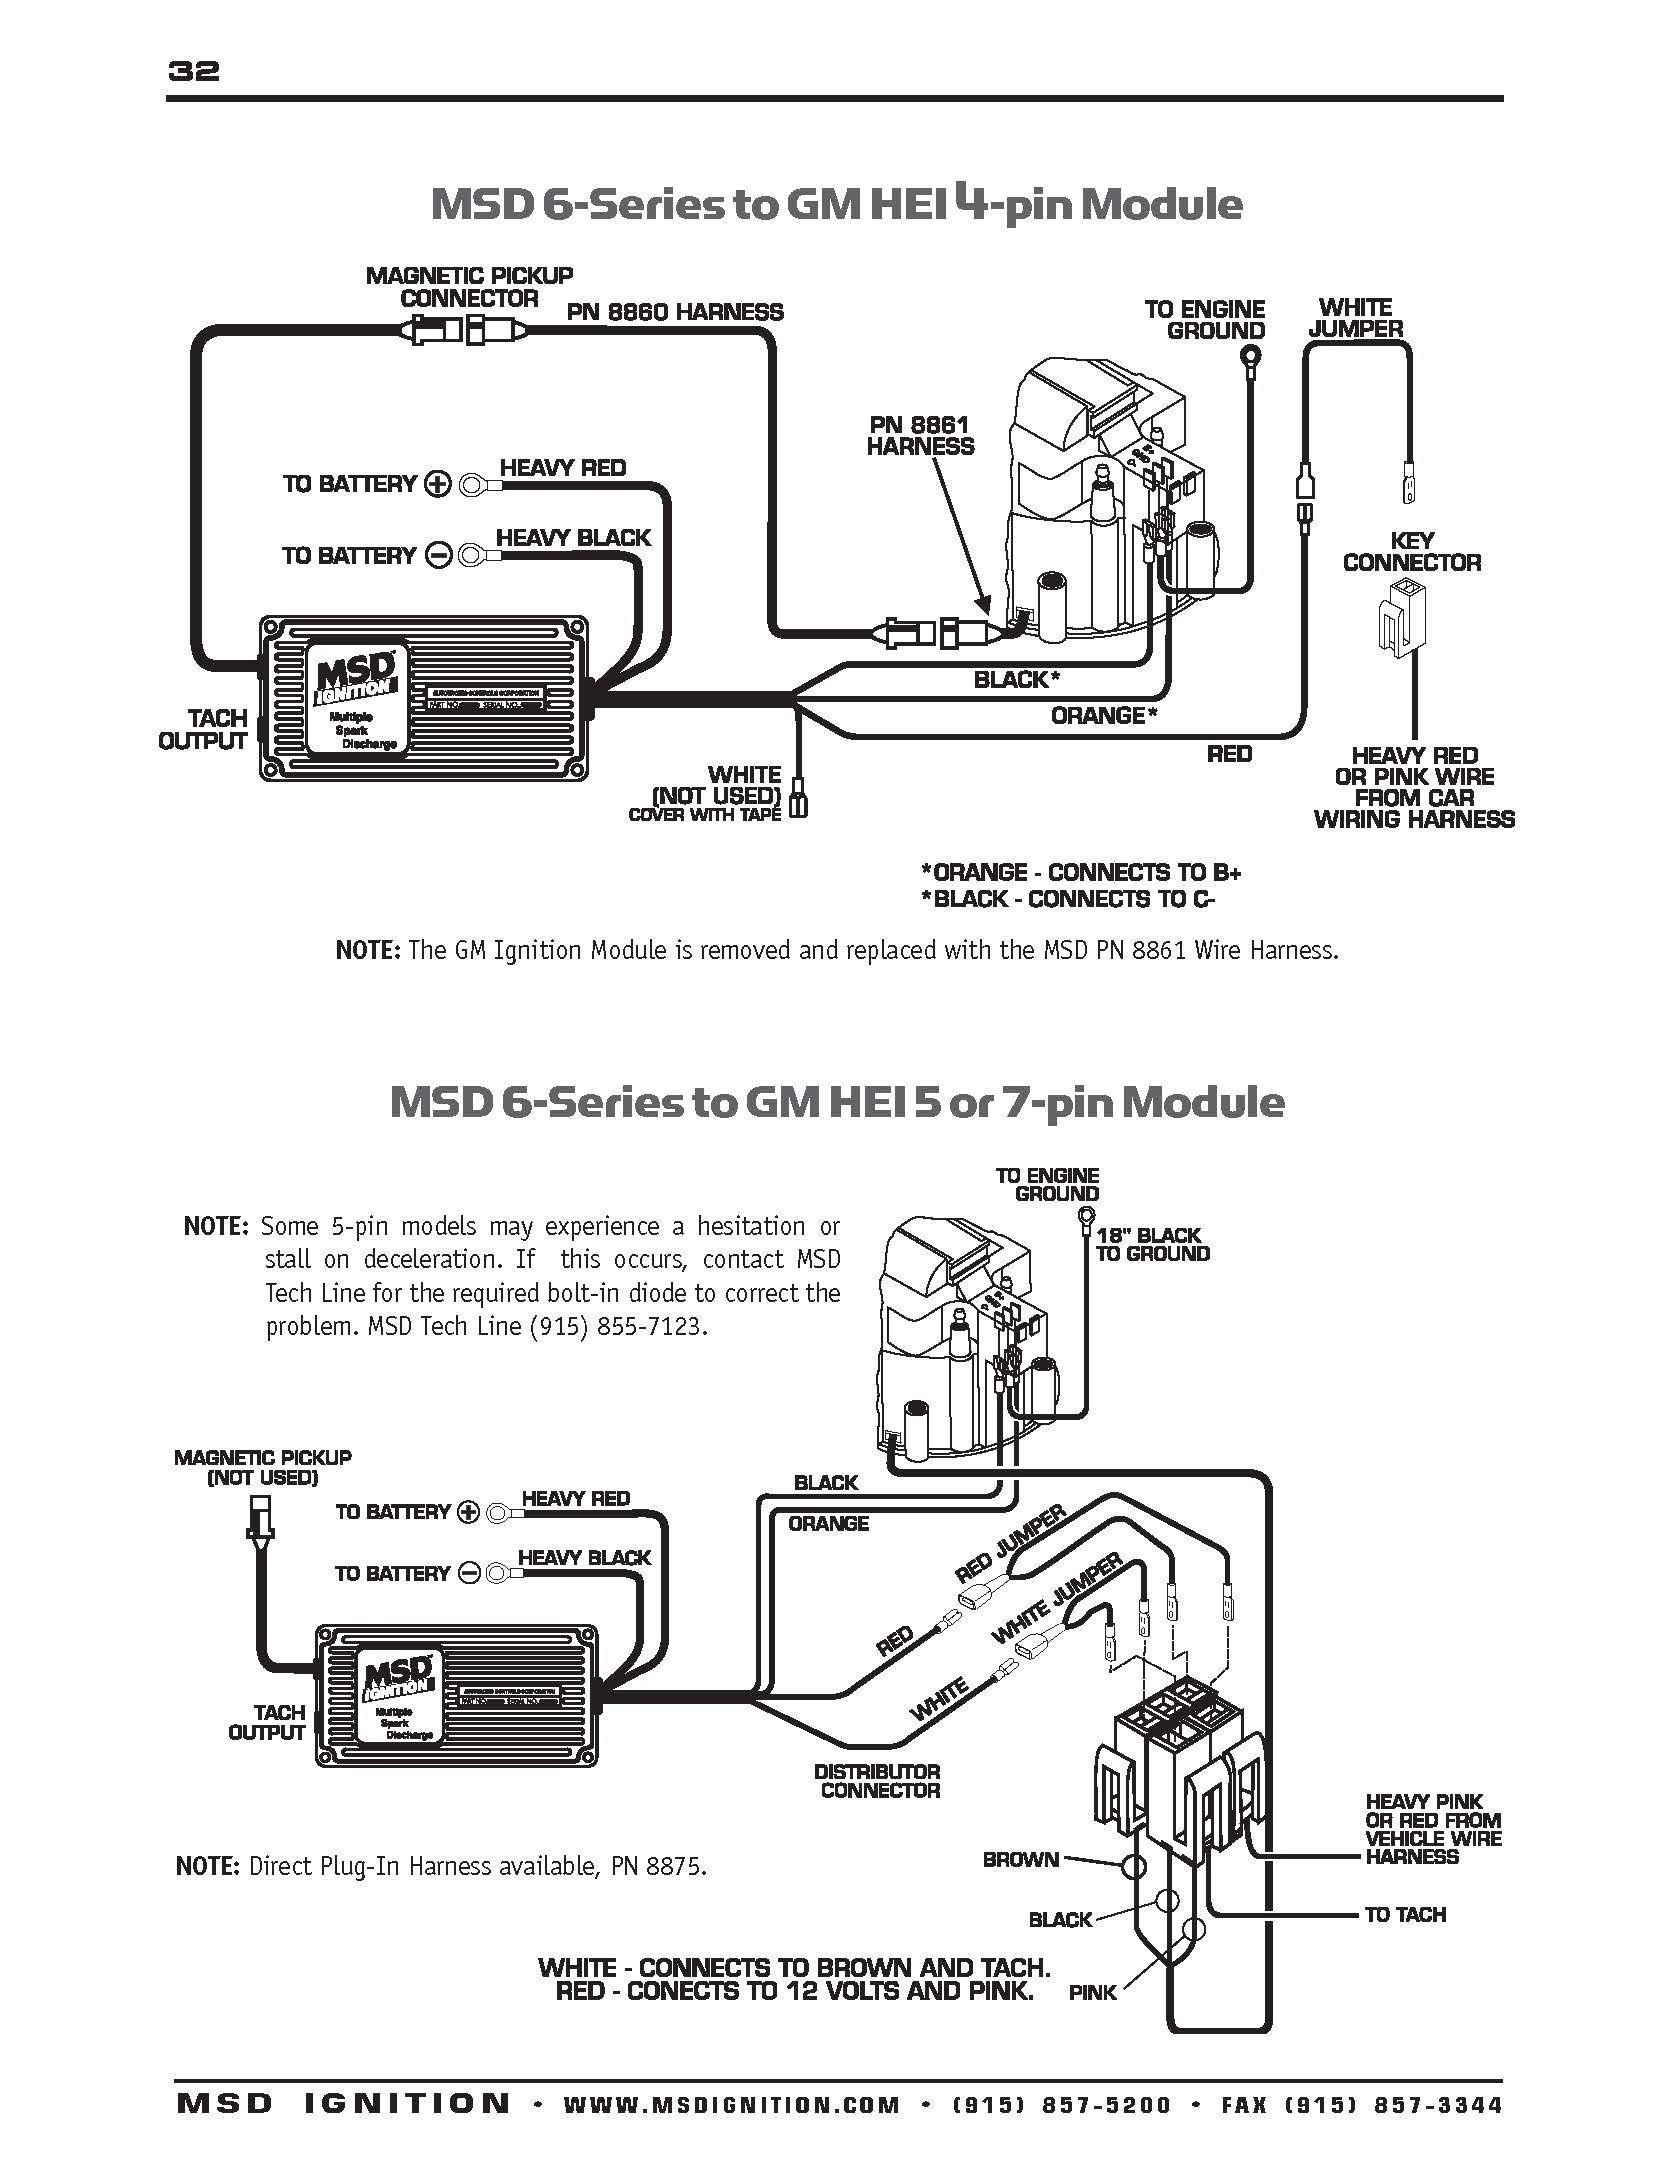 Msd Ignition Wiring - Wiring Diagrams Hubs - Msd Ignition Wiring Diagram